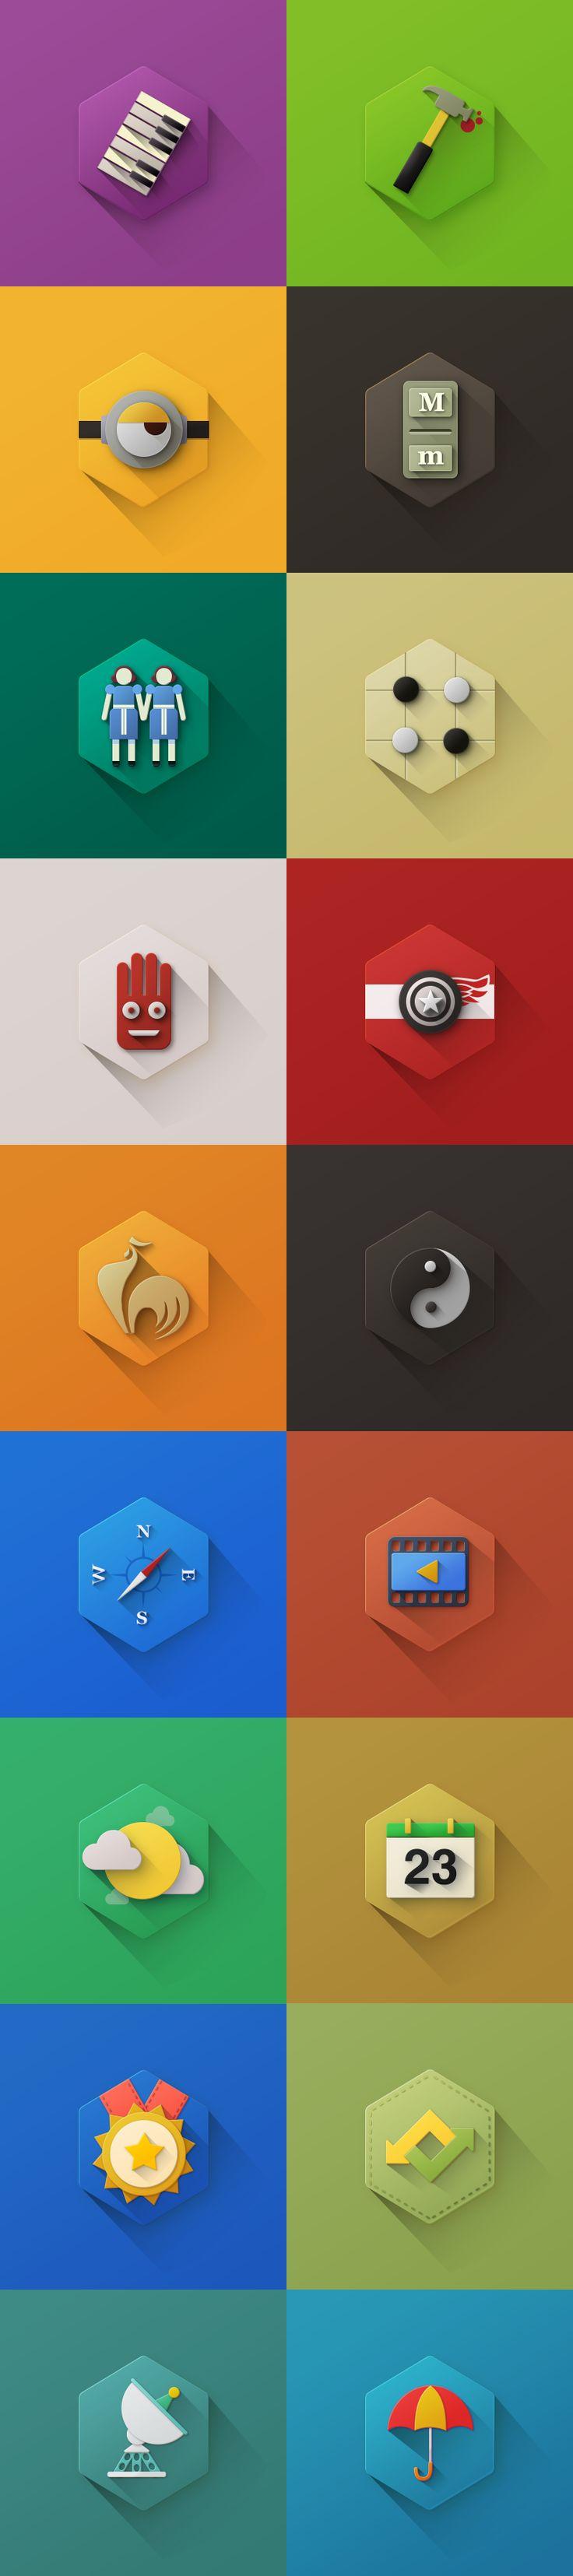 Wireless icon line iconset iconsmind - Long Shadow Icons Avec Un Design Micro Texture